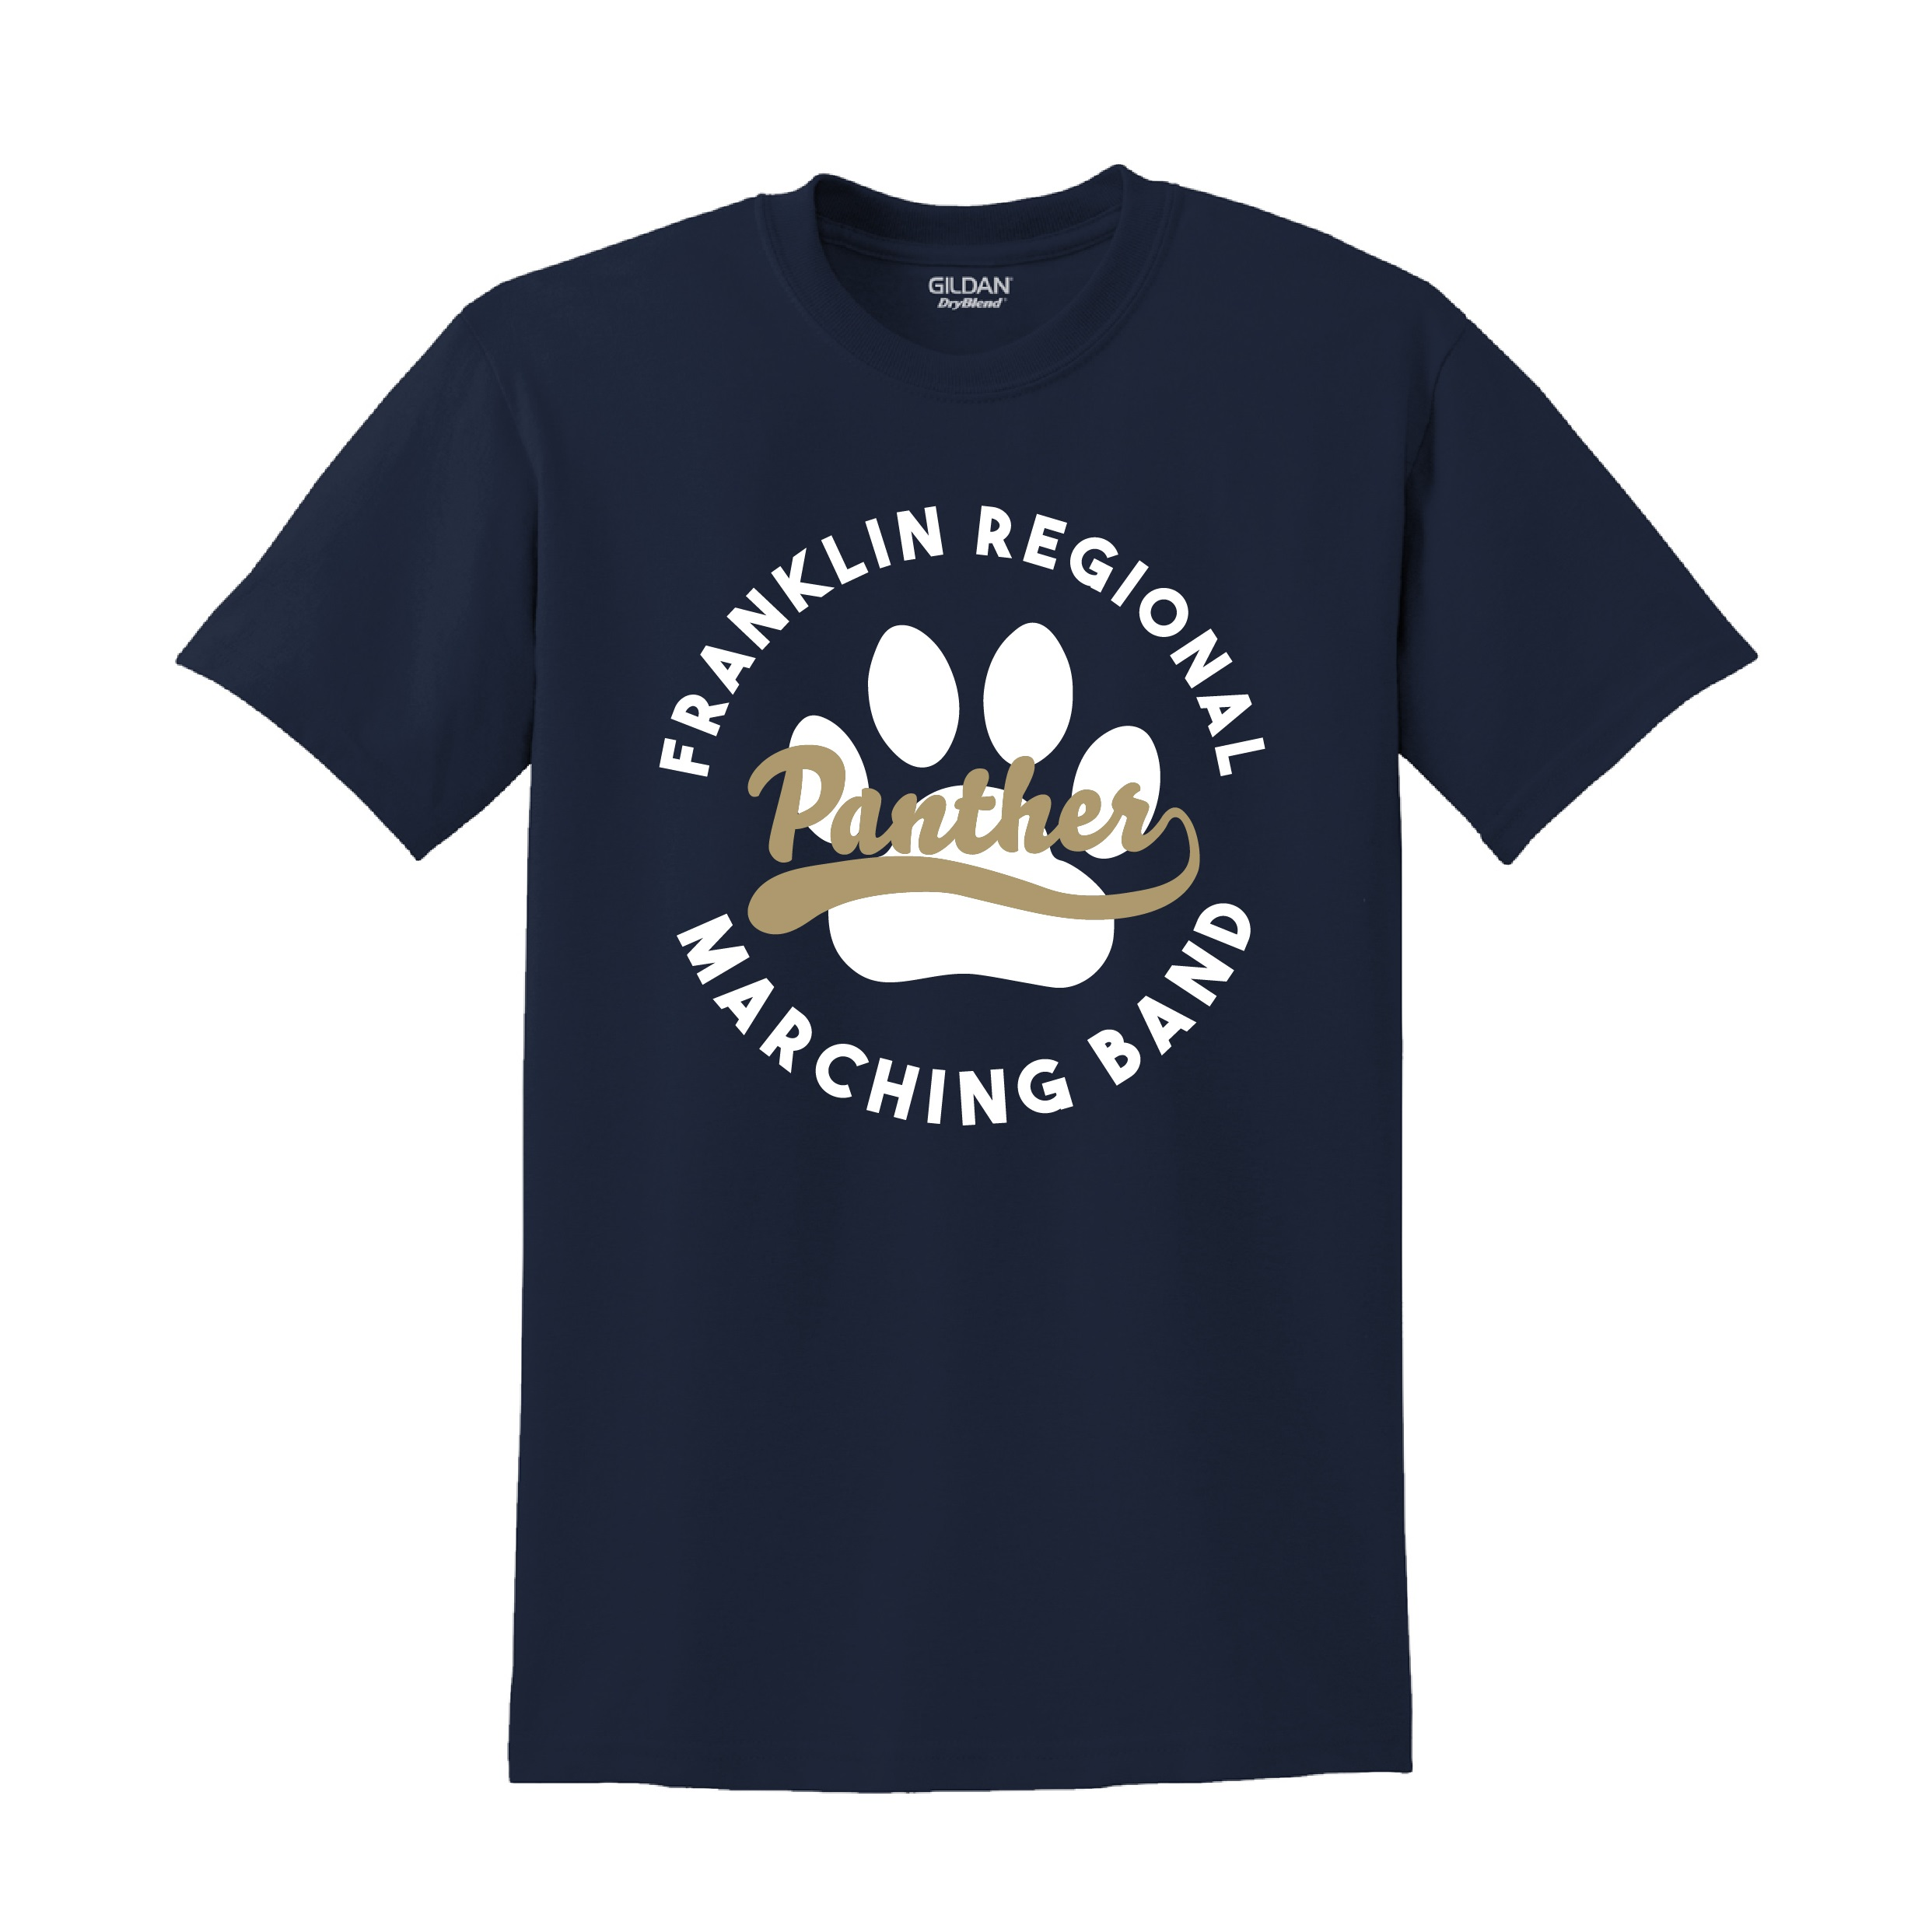 Gildan DryBlend 50/50 T-Shirt (Available in Navy or Sport Grey)